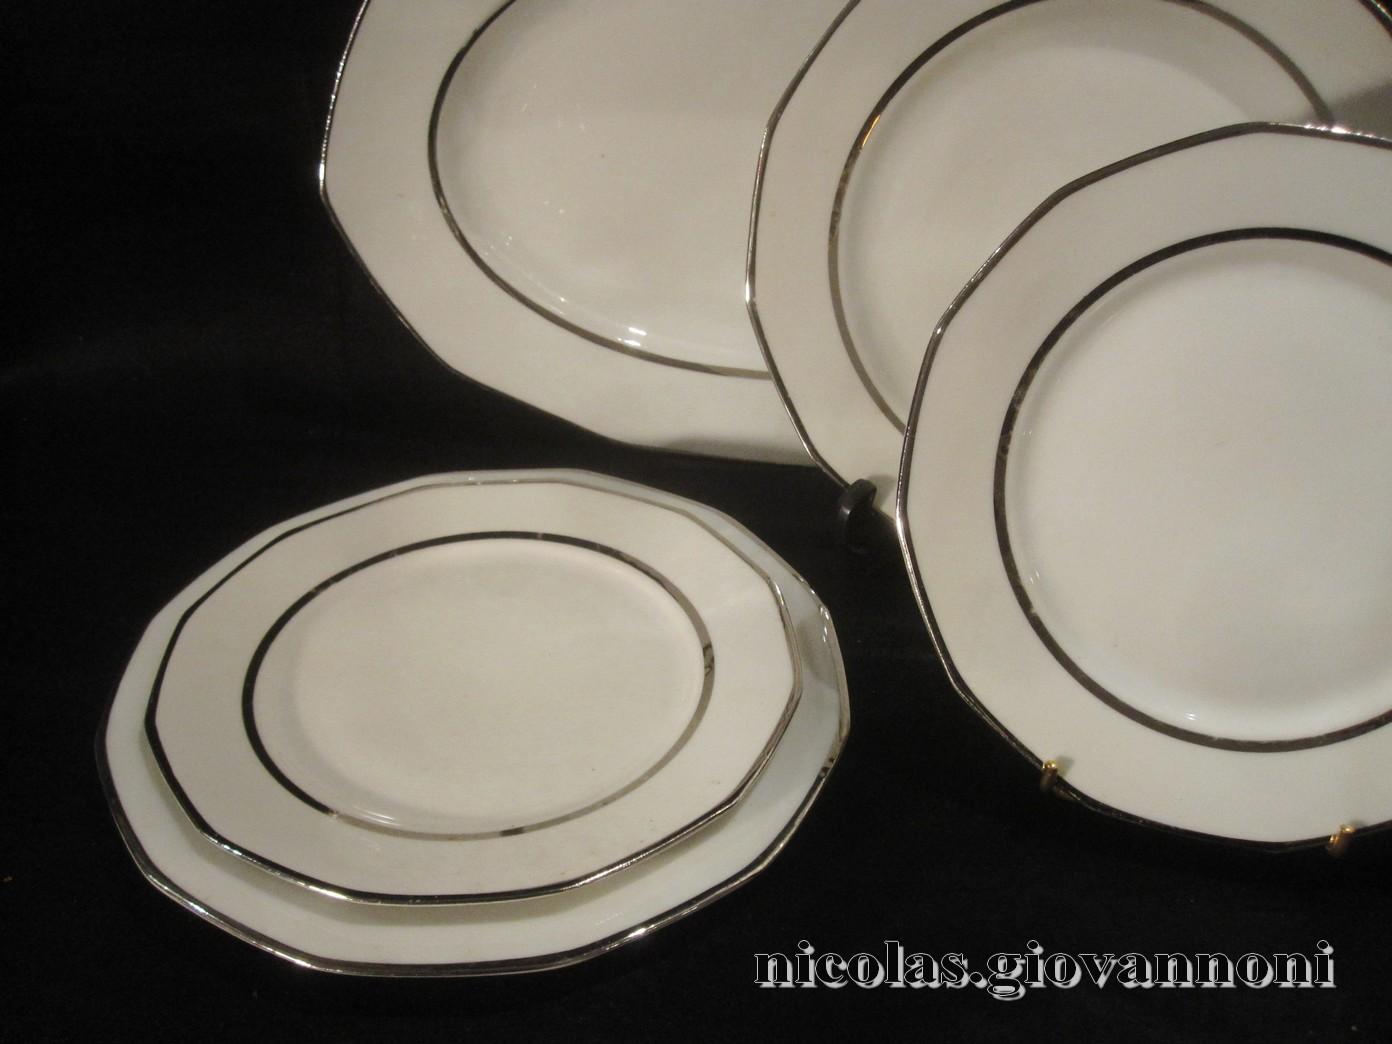 legrand limoges porcelaine catalogue cristal de. Black Bedroom Furniture Sets. Home Design Ideas